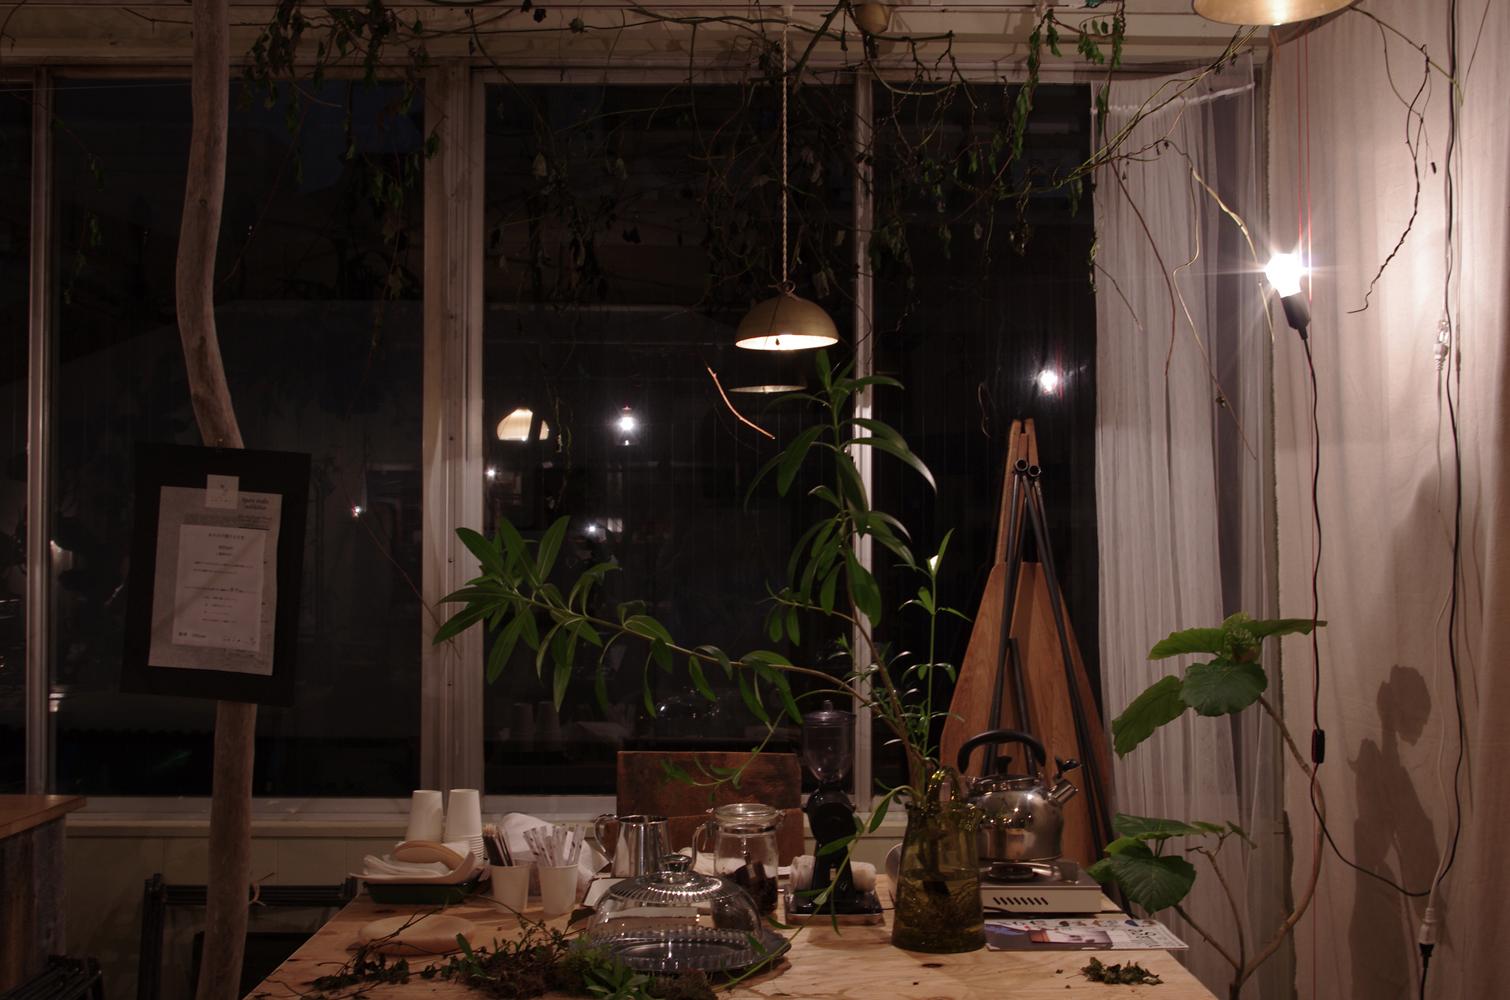 tipura-studio-ironworks-exhibition-3